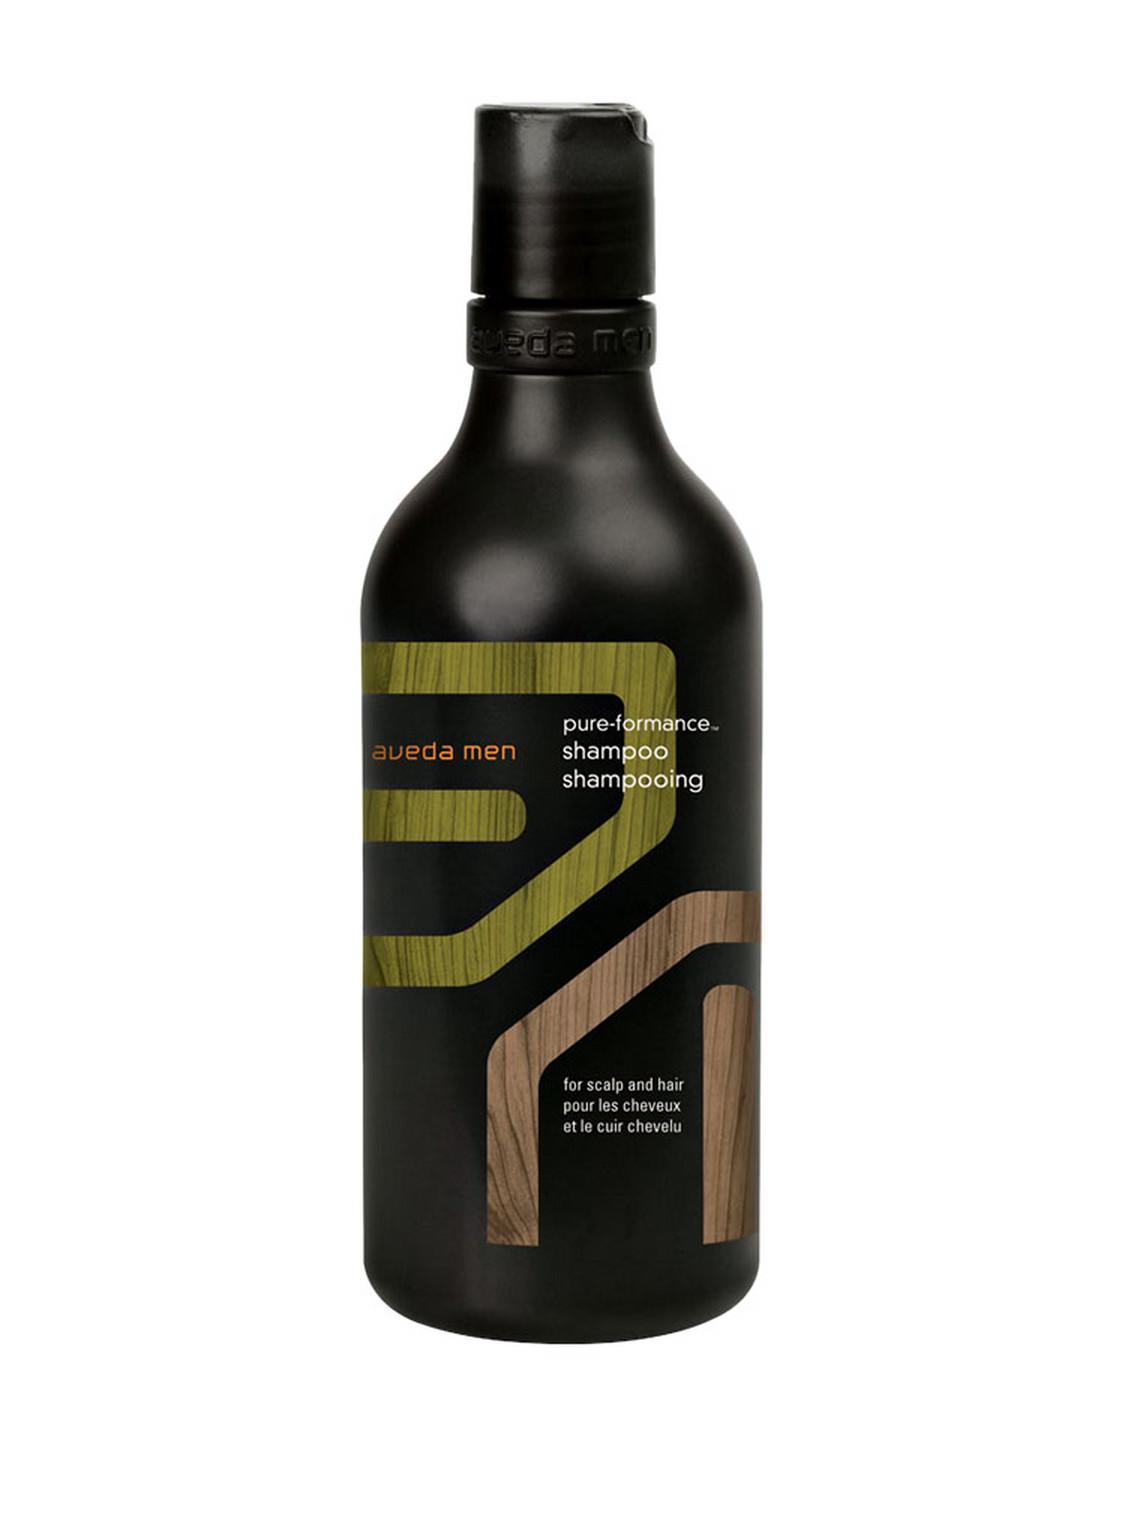 Image of Aveda Aveda Men Pure-Formance Shampoo 300 ml